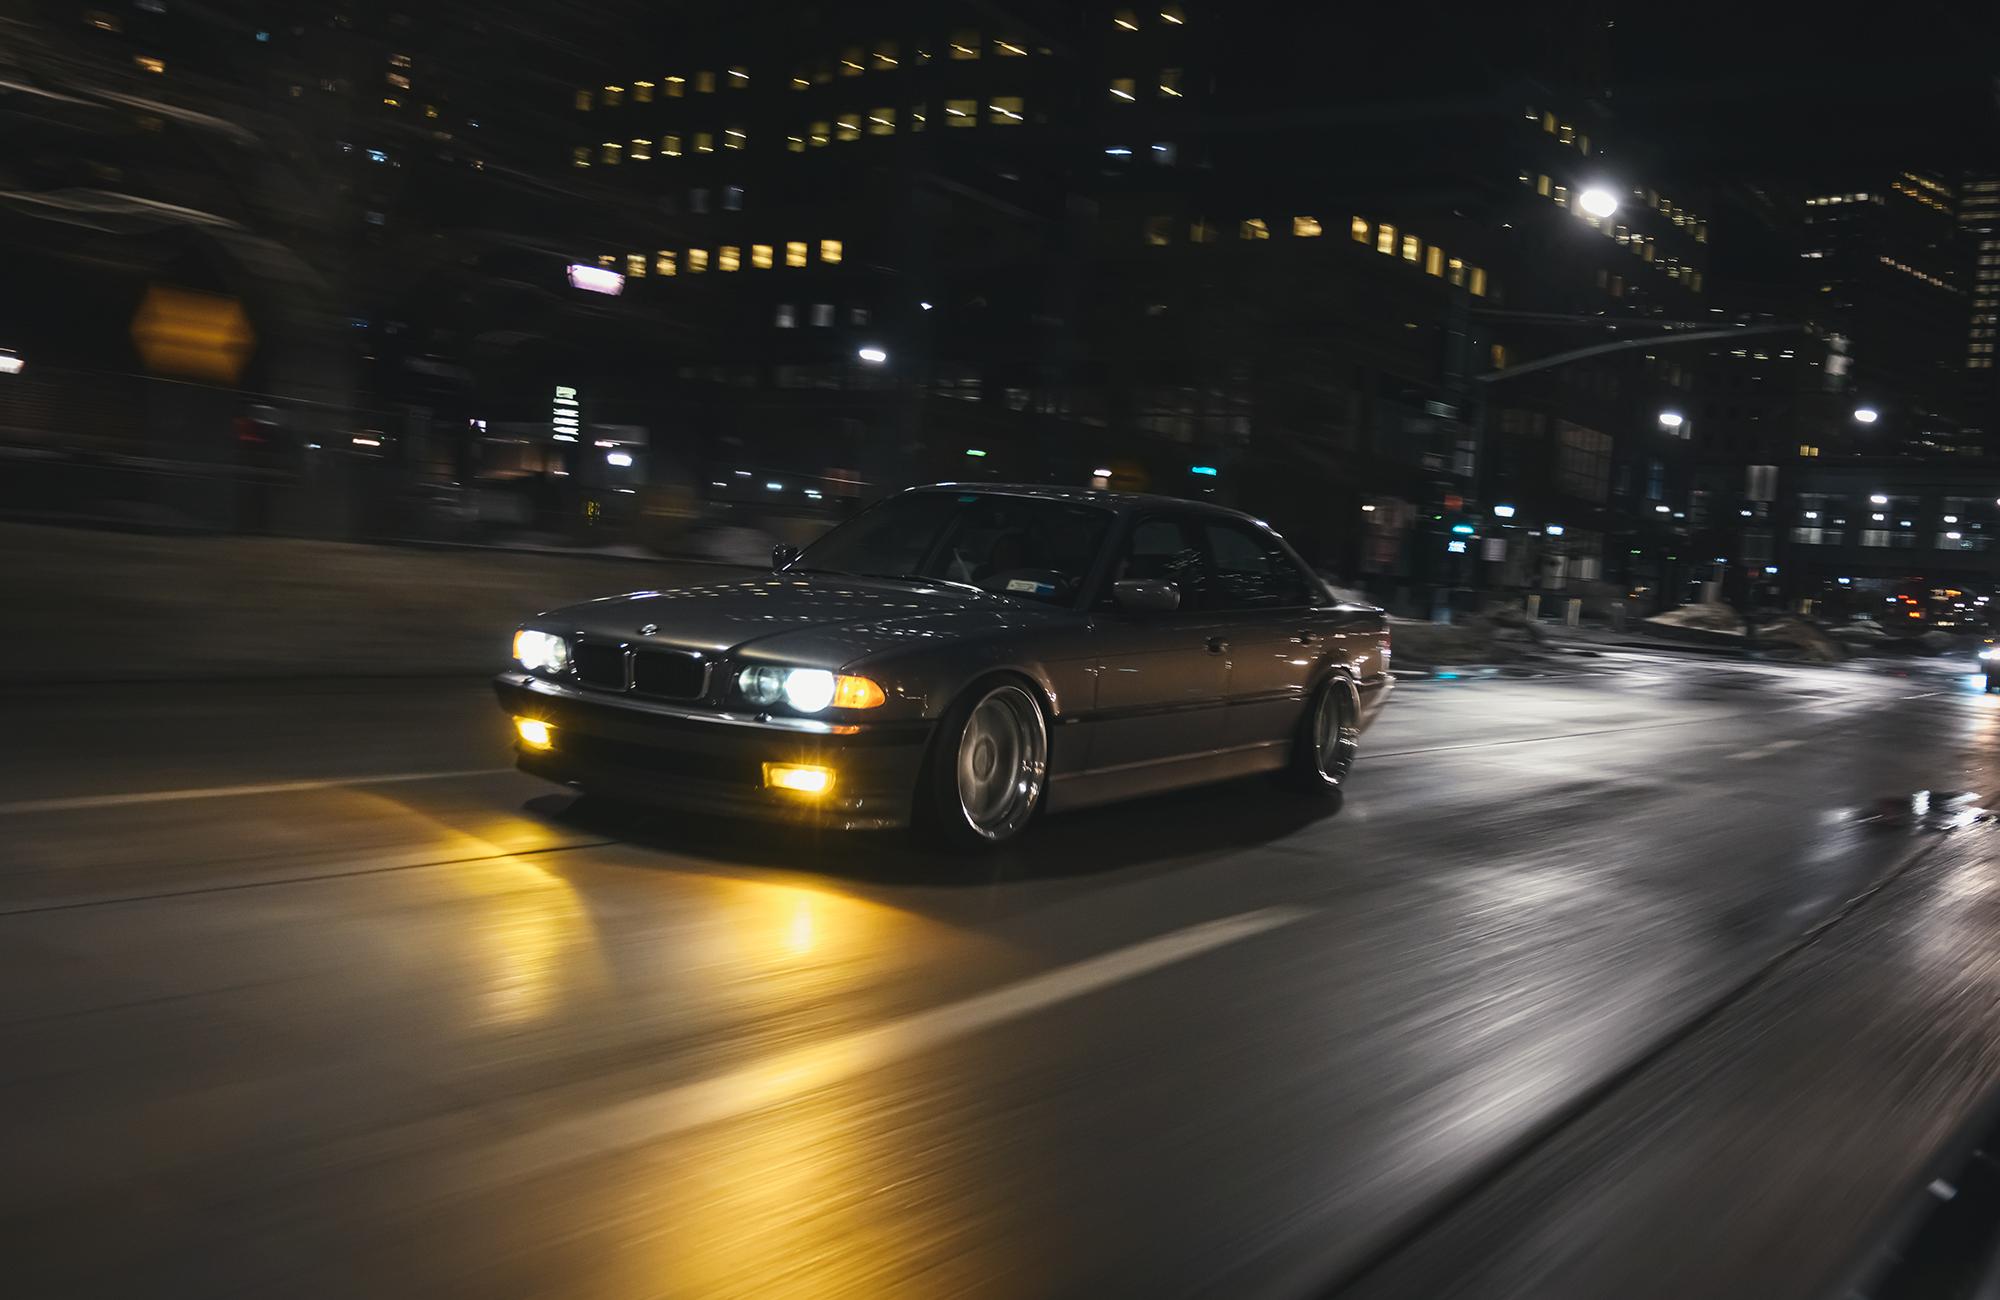 BMW E38 7 Series roller